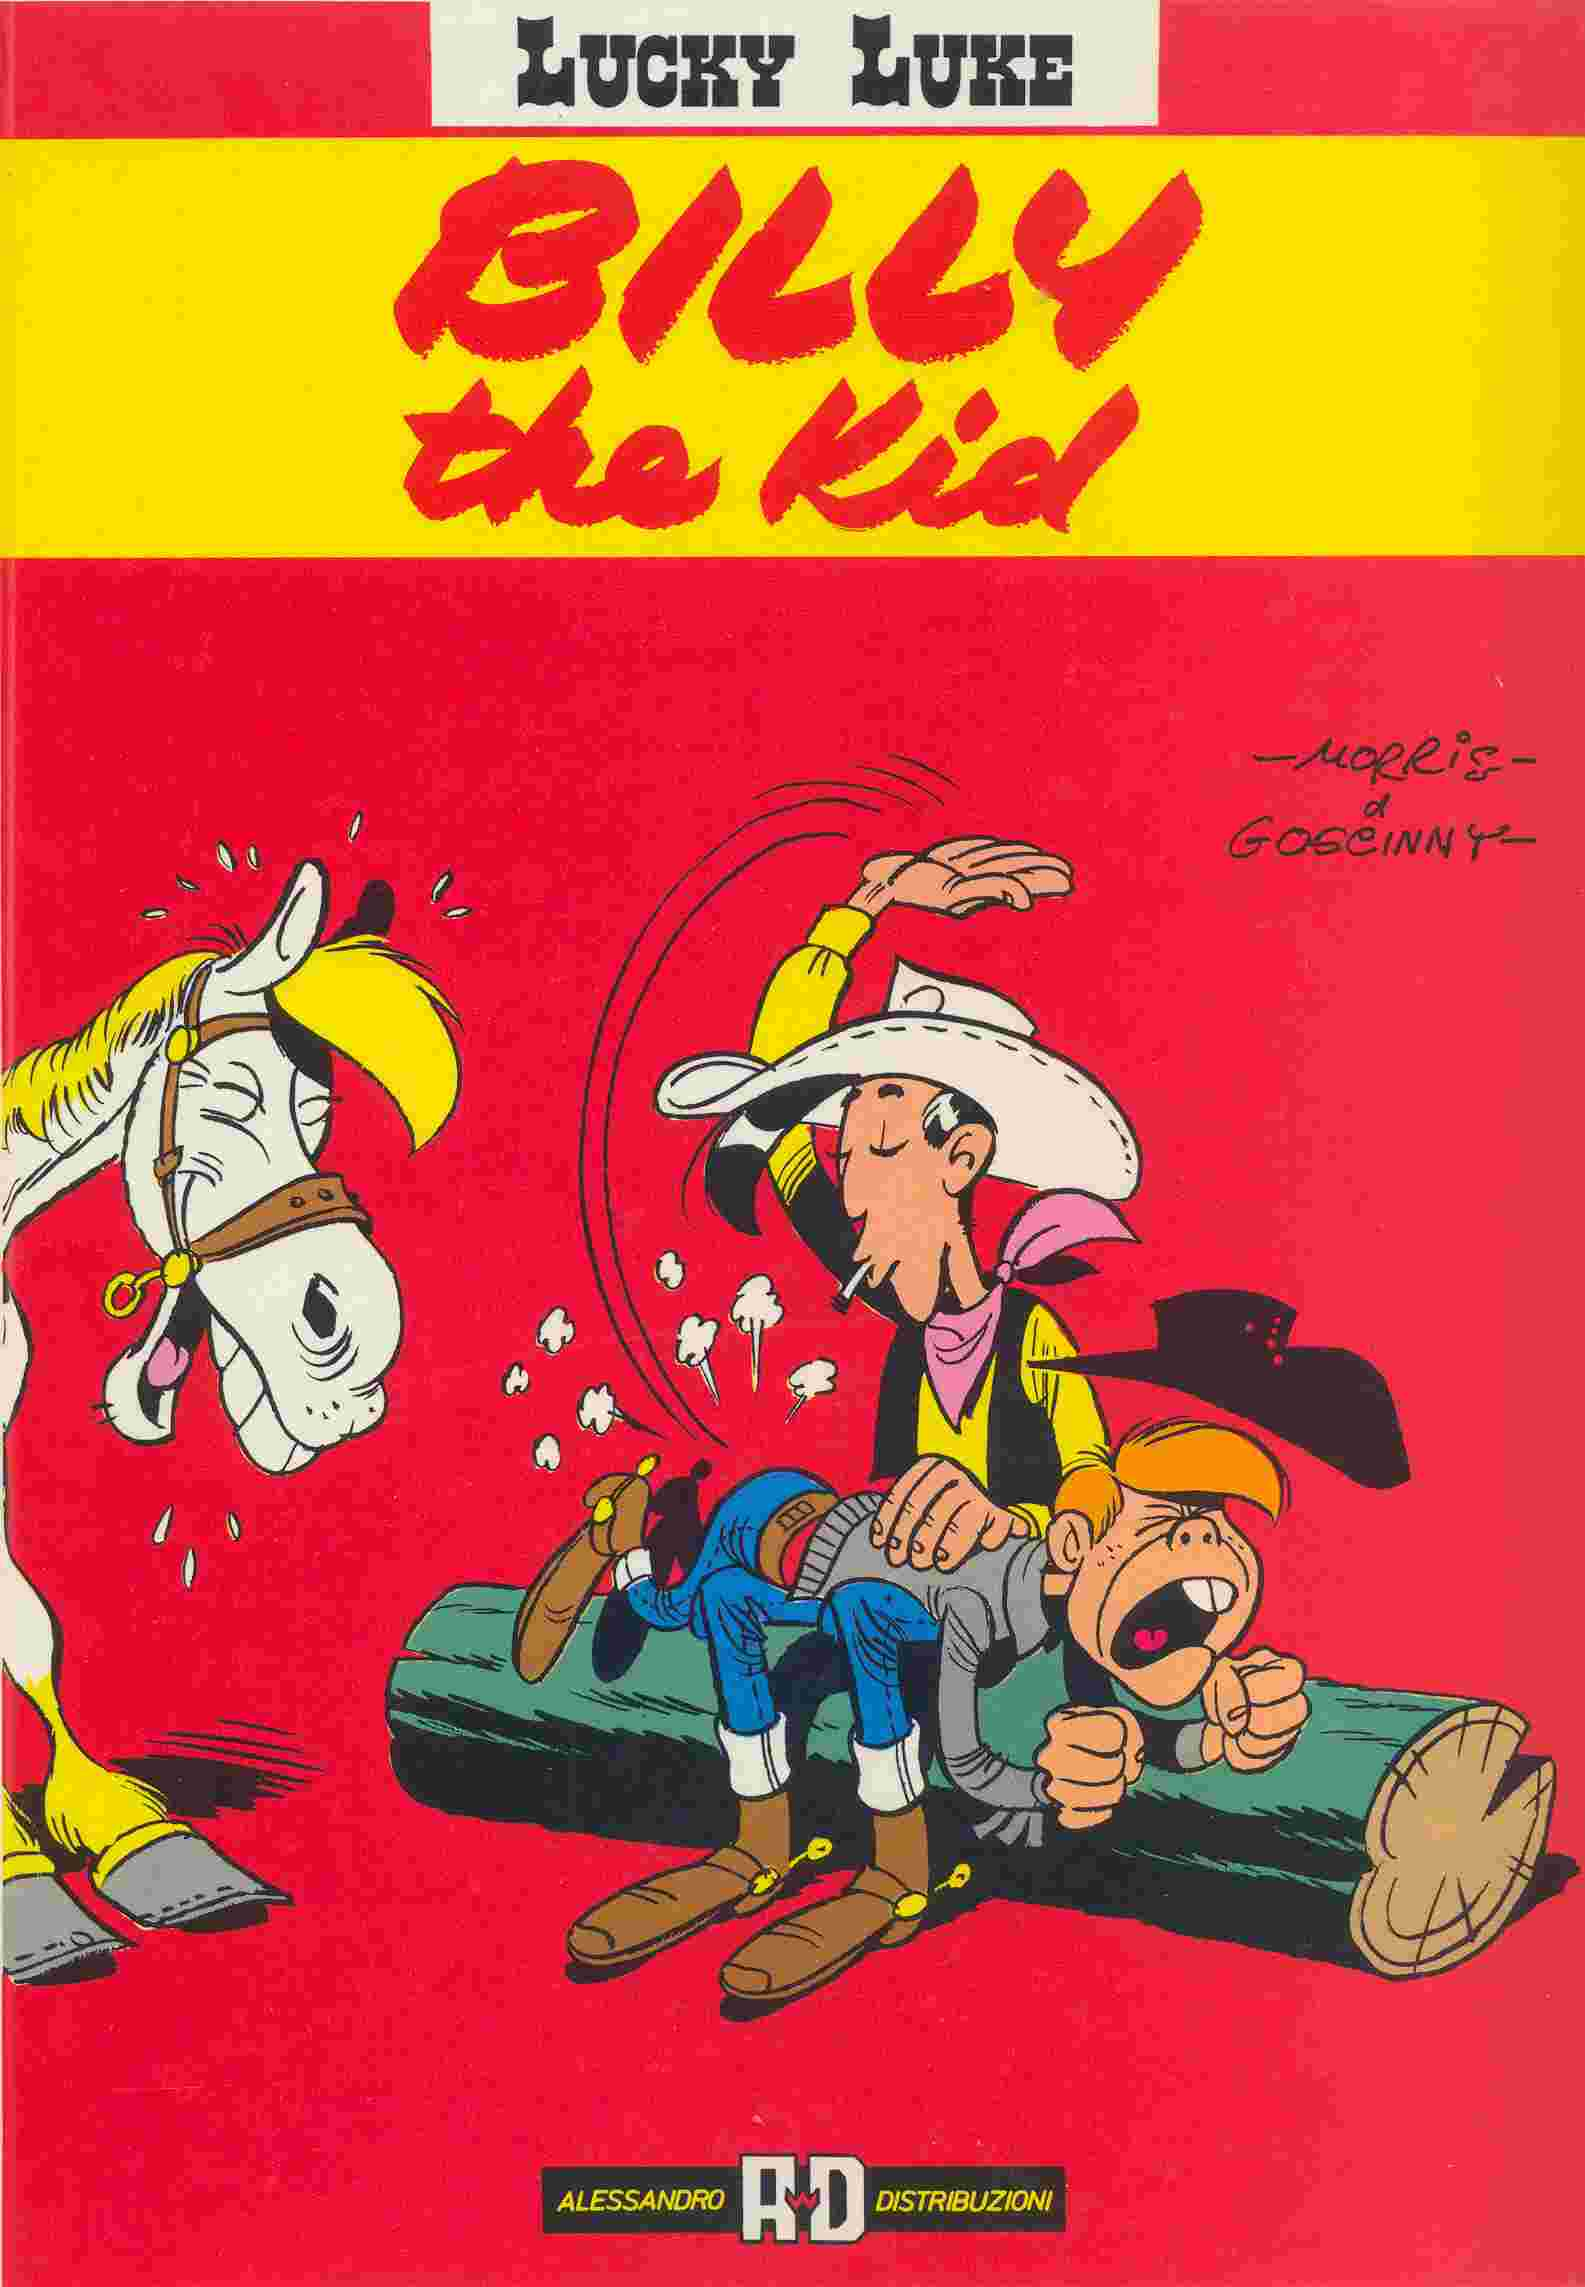 Lucky Luke - Billy the kid